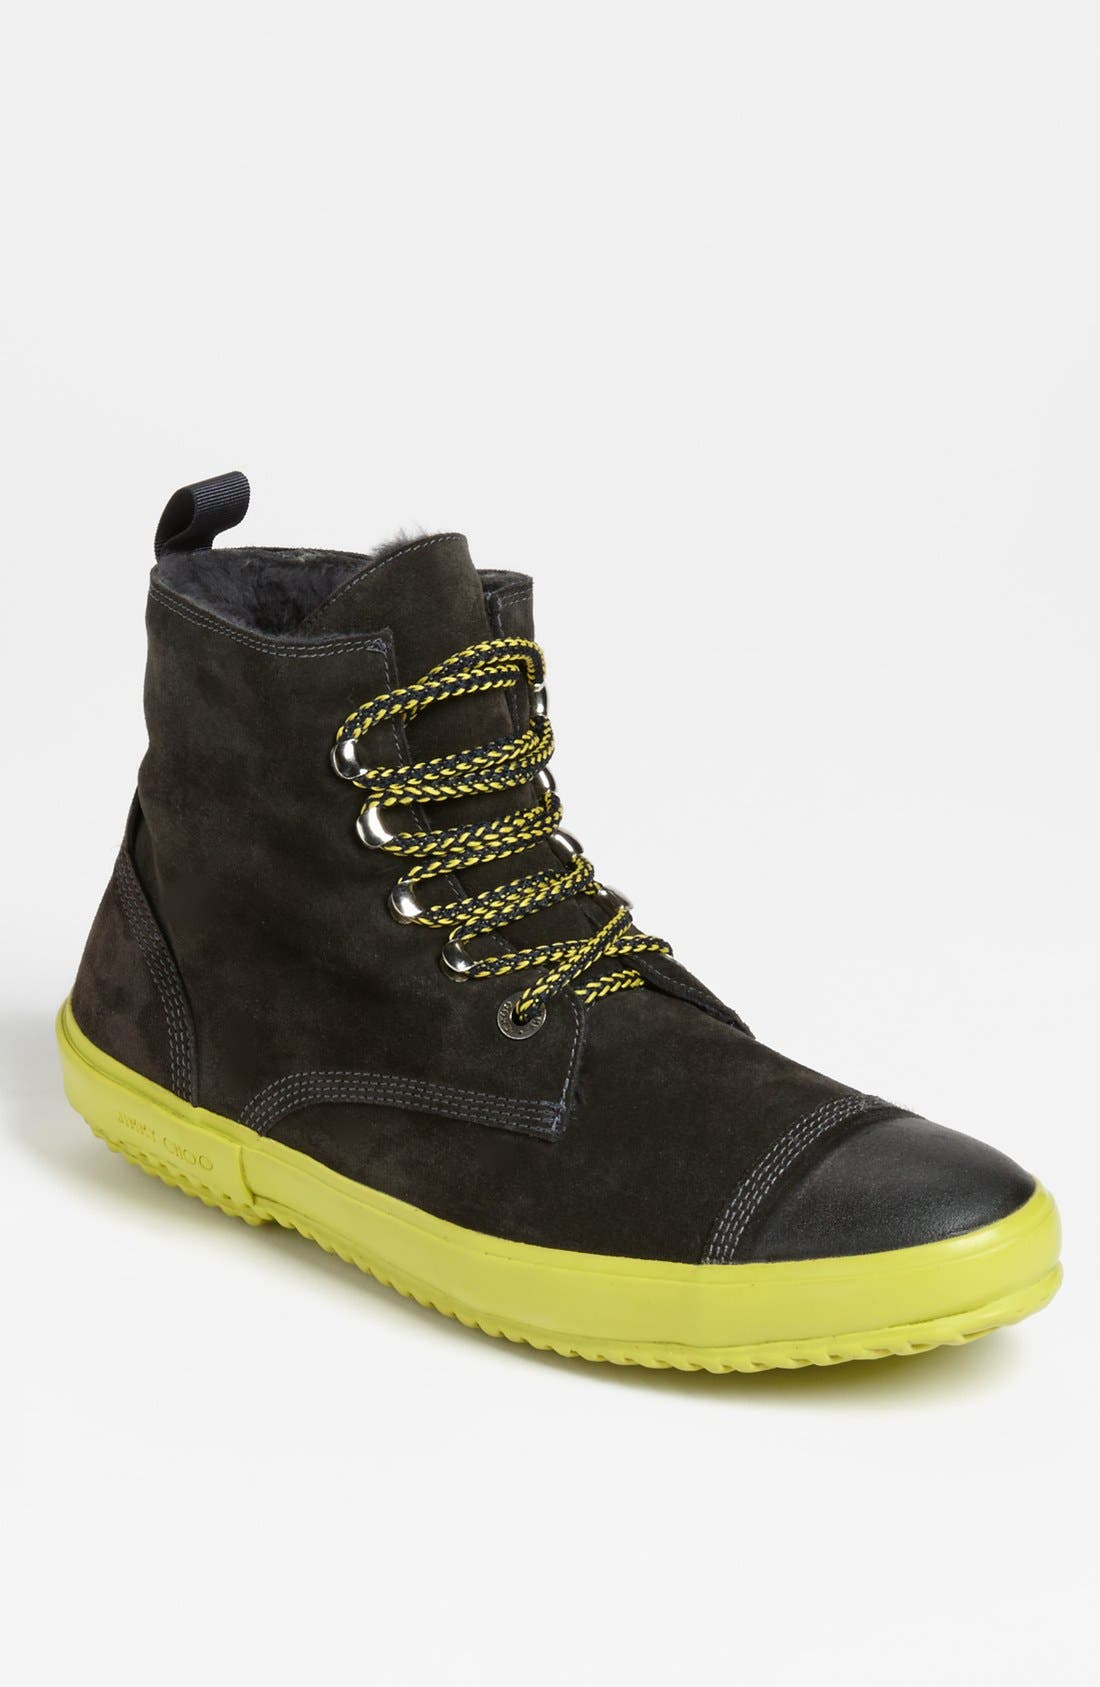 Main Image - Jimmy Choo 'Cabot' Sneaker